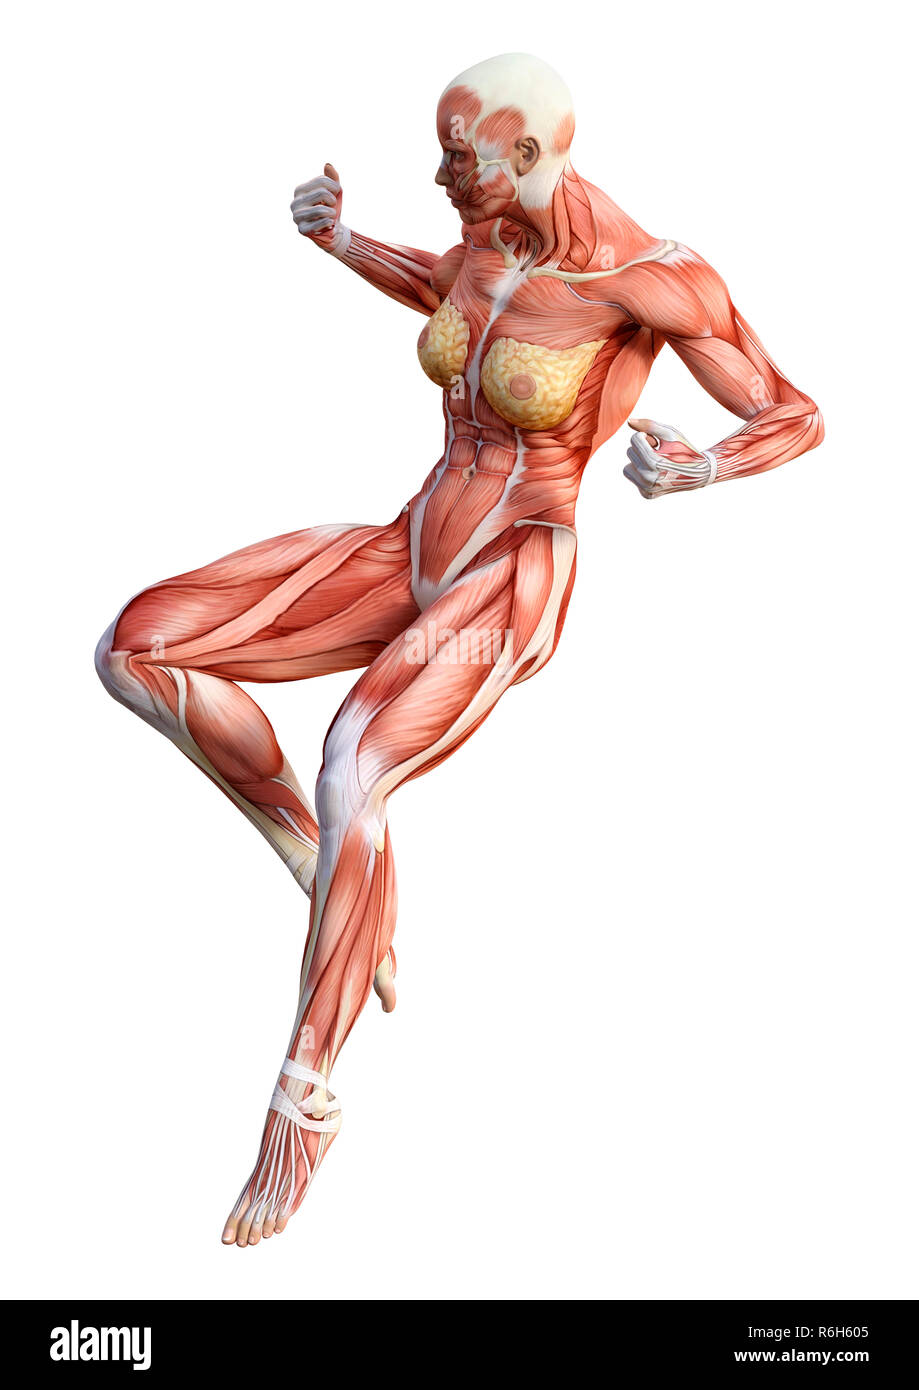 3d Rendering Female Anatomy Figure On White Stock Photo 227800613